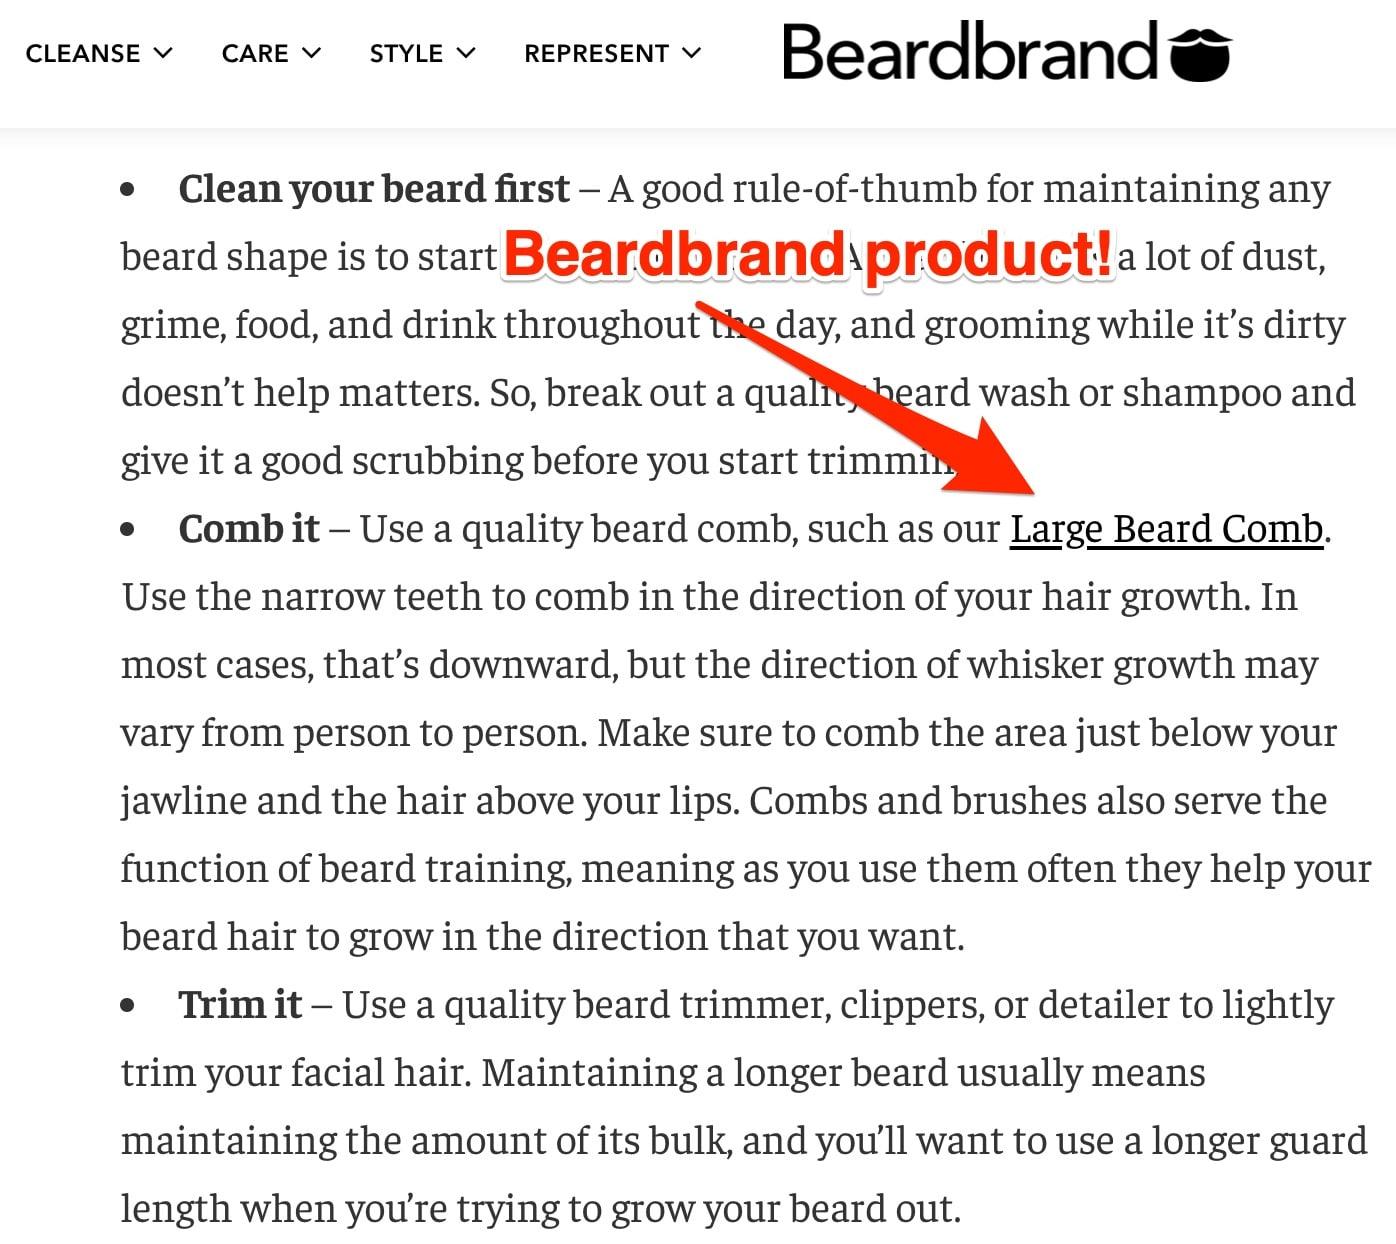 beardbrand-blog-post